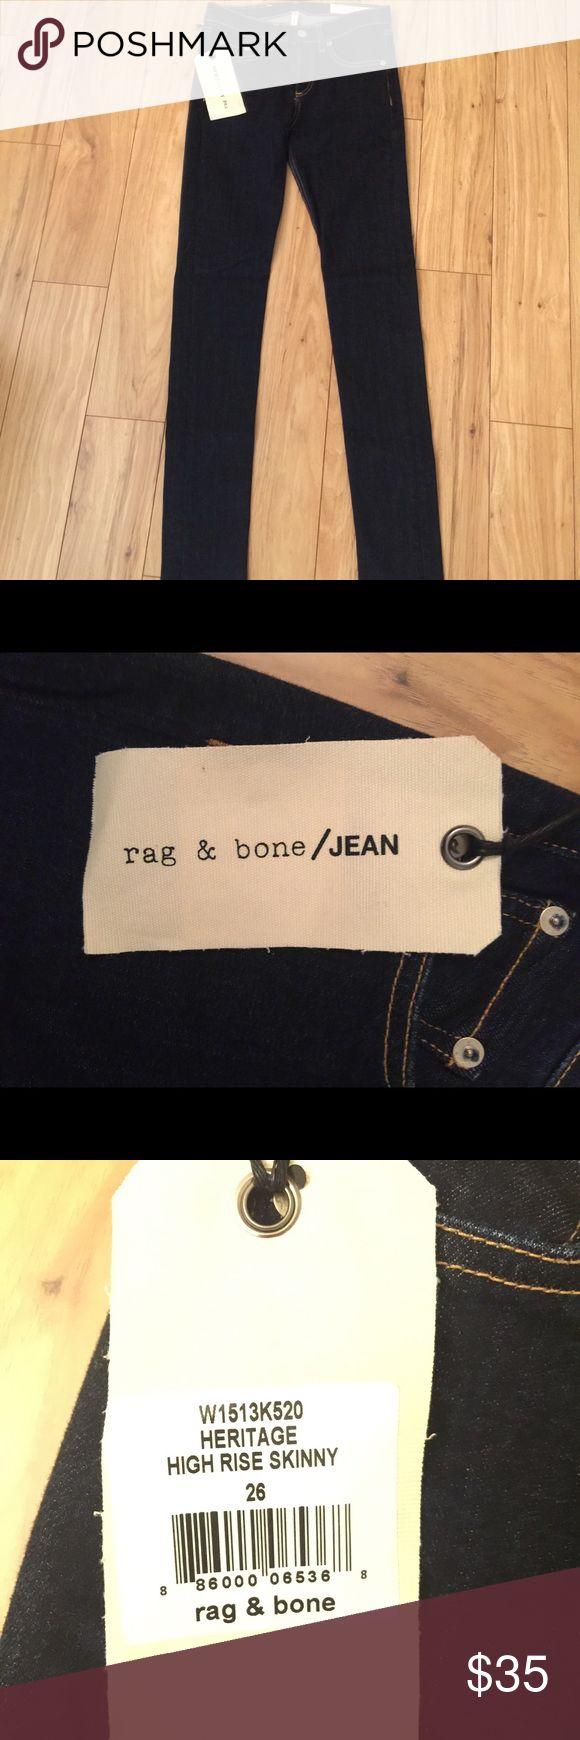 Rag & Bone Heritage High Rise Skinny Jeans Rag & Bone Heritage High Rise Skinny Jeans rag & bone Jeans Skinny